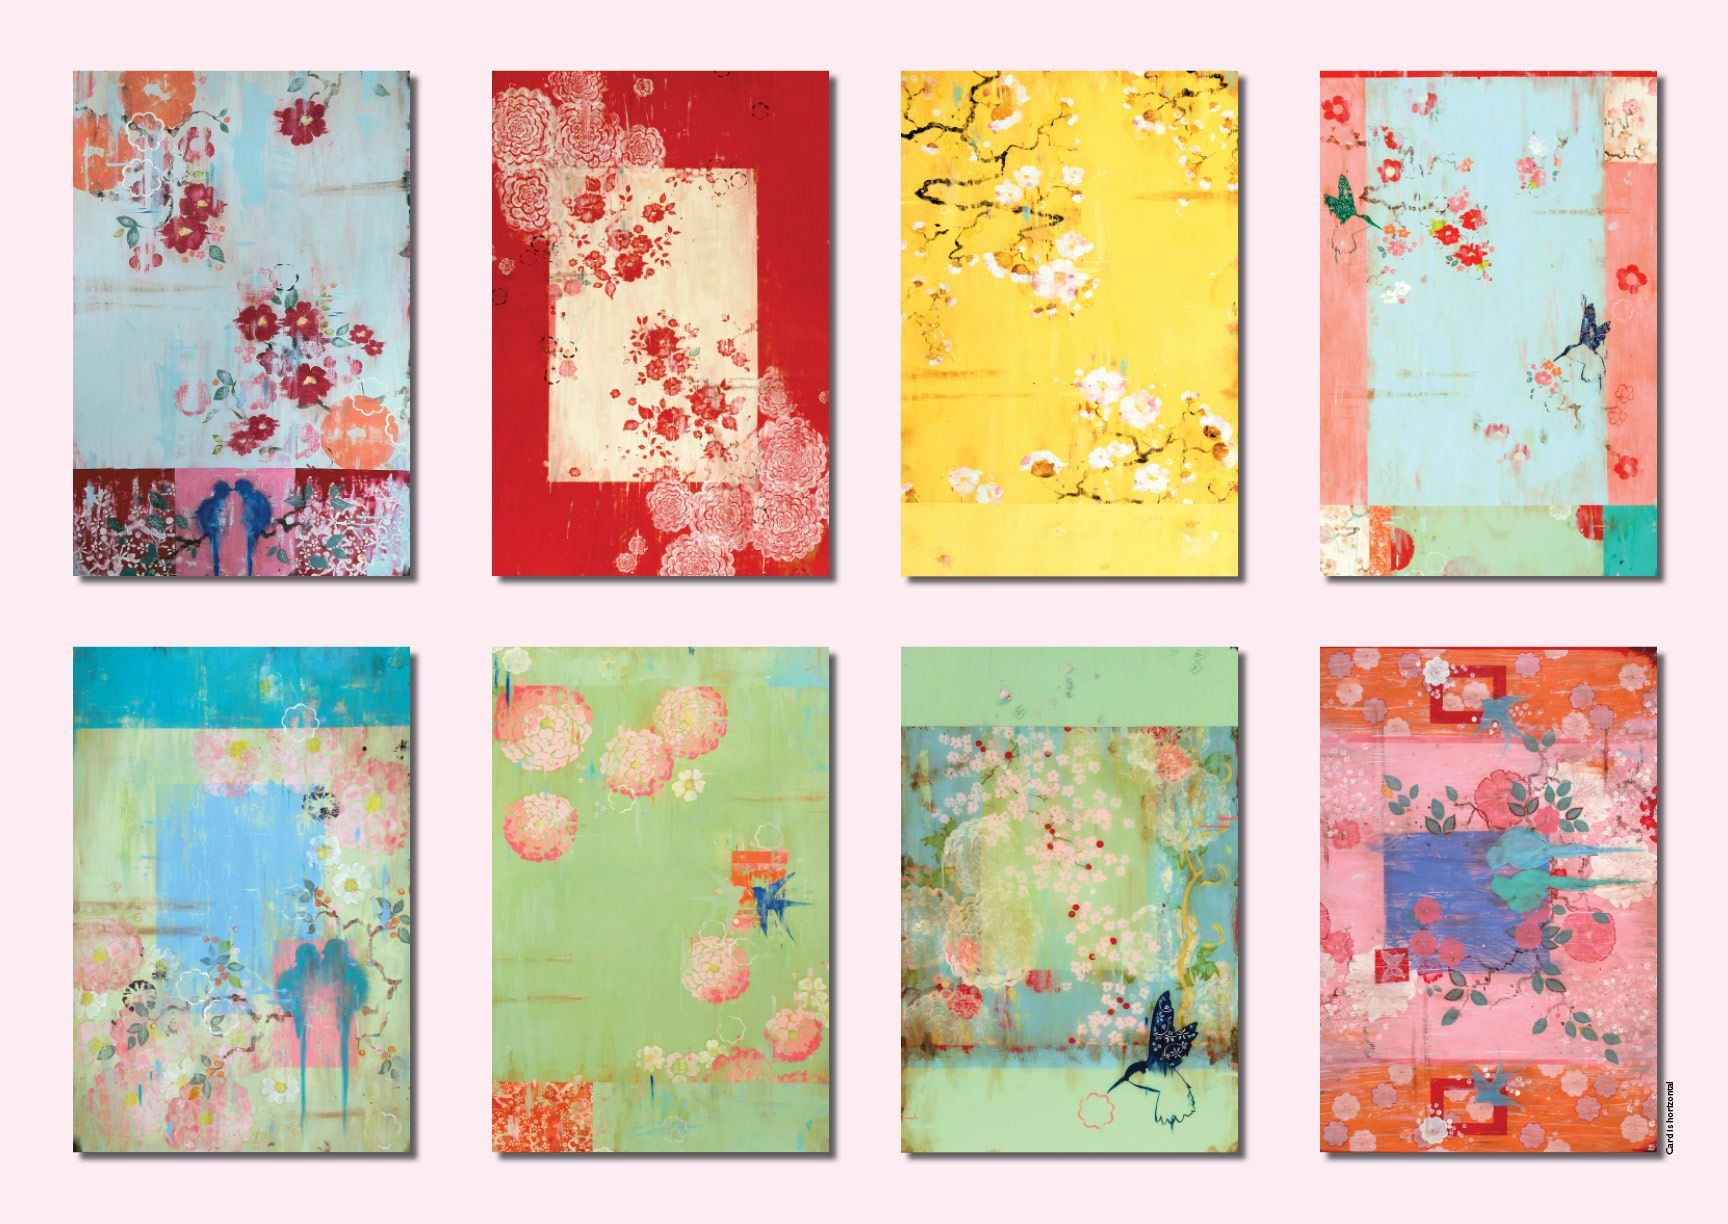 Kathe fraga greeting cards mail art pinterest chinoiserie kathe fraga greeting cards kristyandbryce Gallery